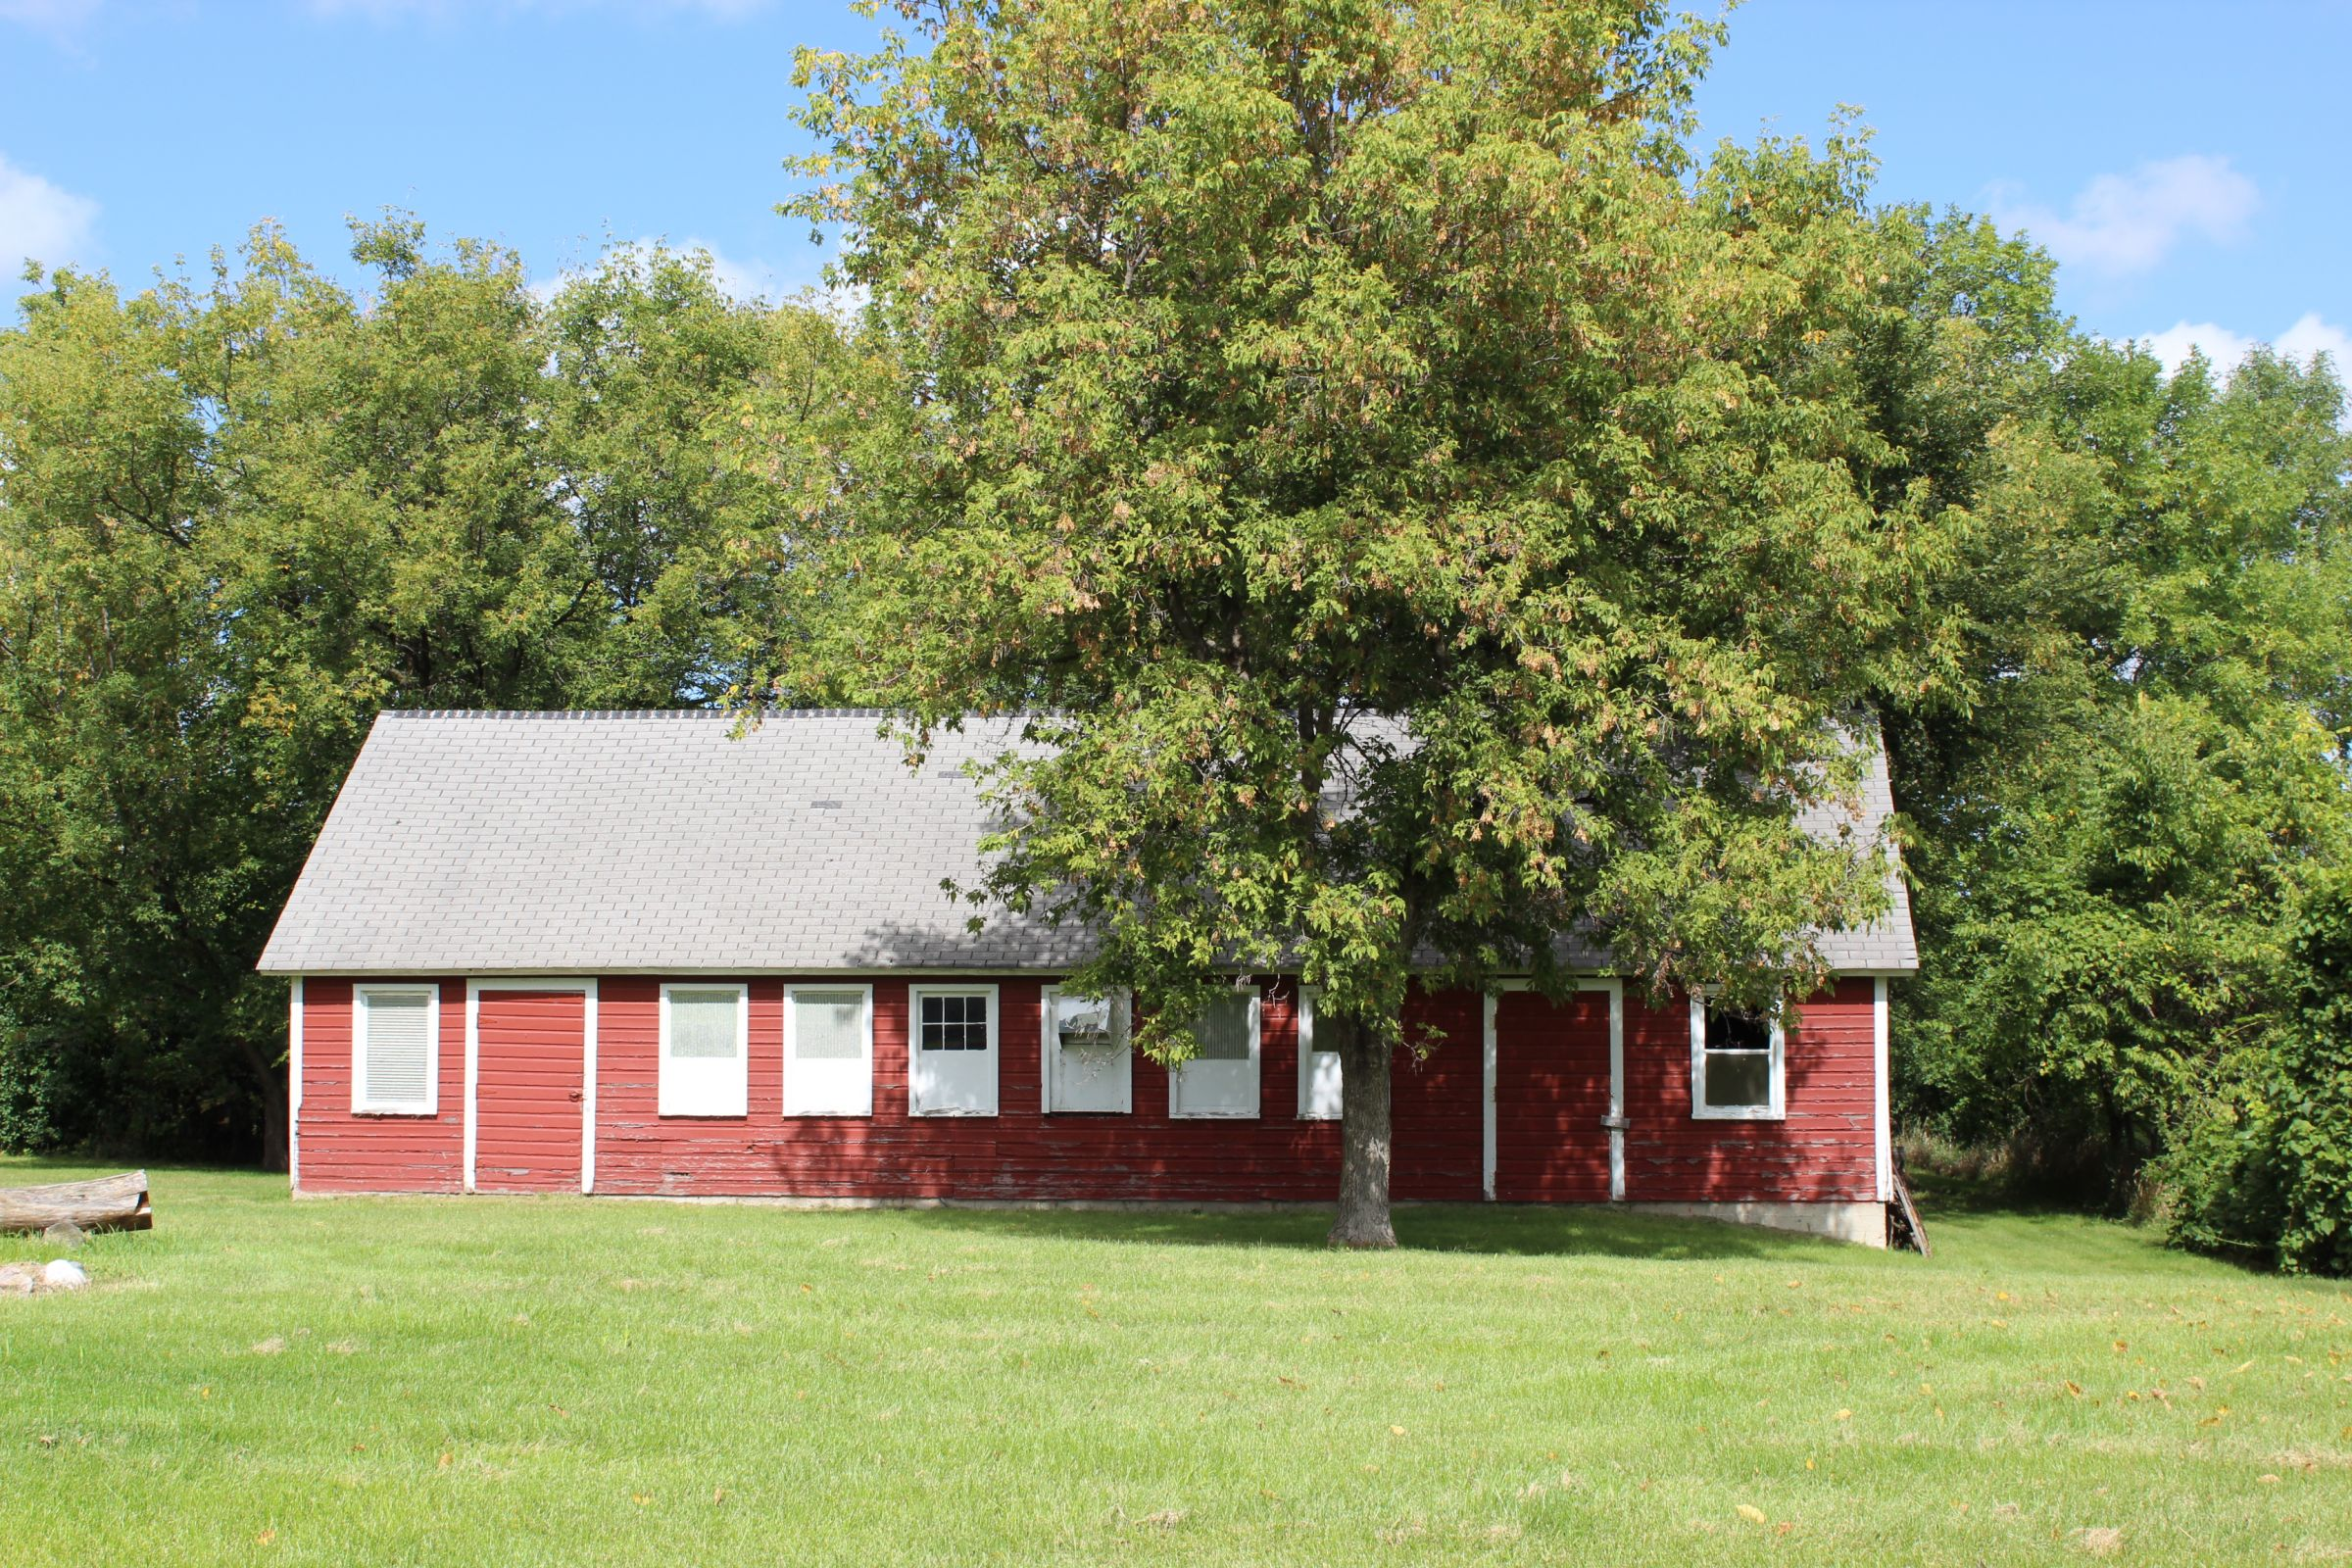 residential-land-mcleod-county-minnesota-80-acres-listing-number-15182-12-2020-09-23-163833.JPG